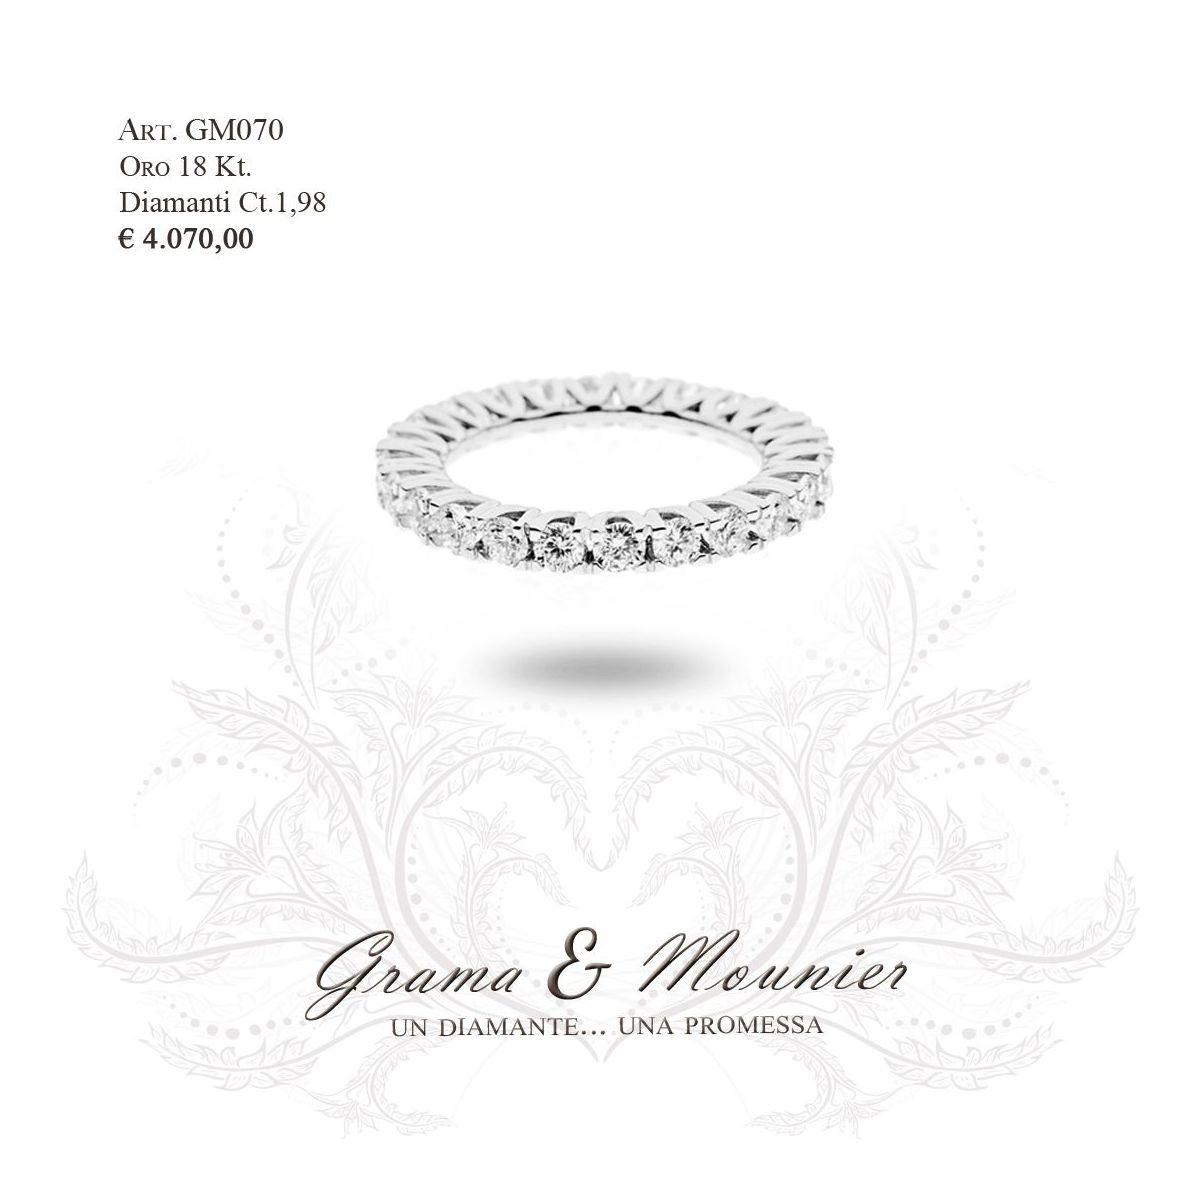 Anello in oro 18Kt. Grama&Mounier Art.GM070/16/19